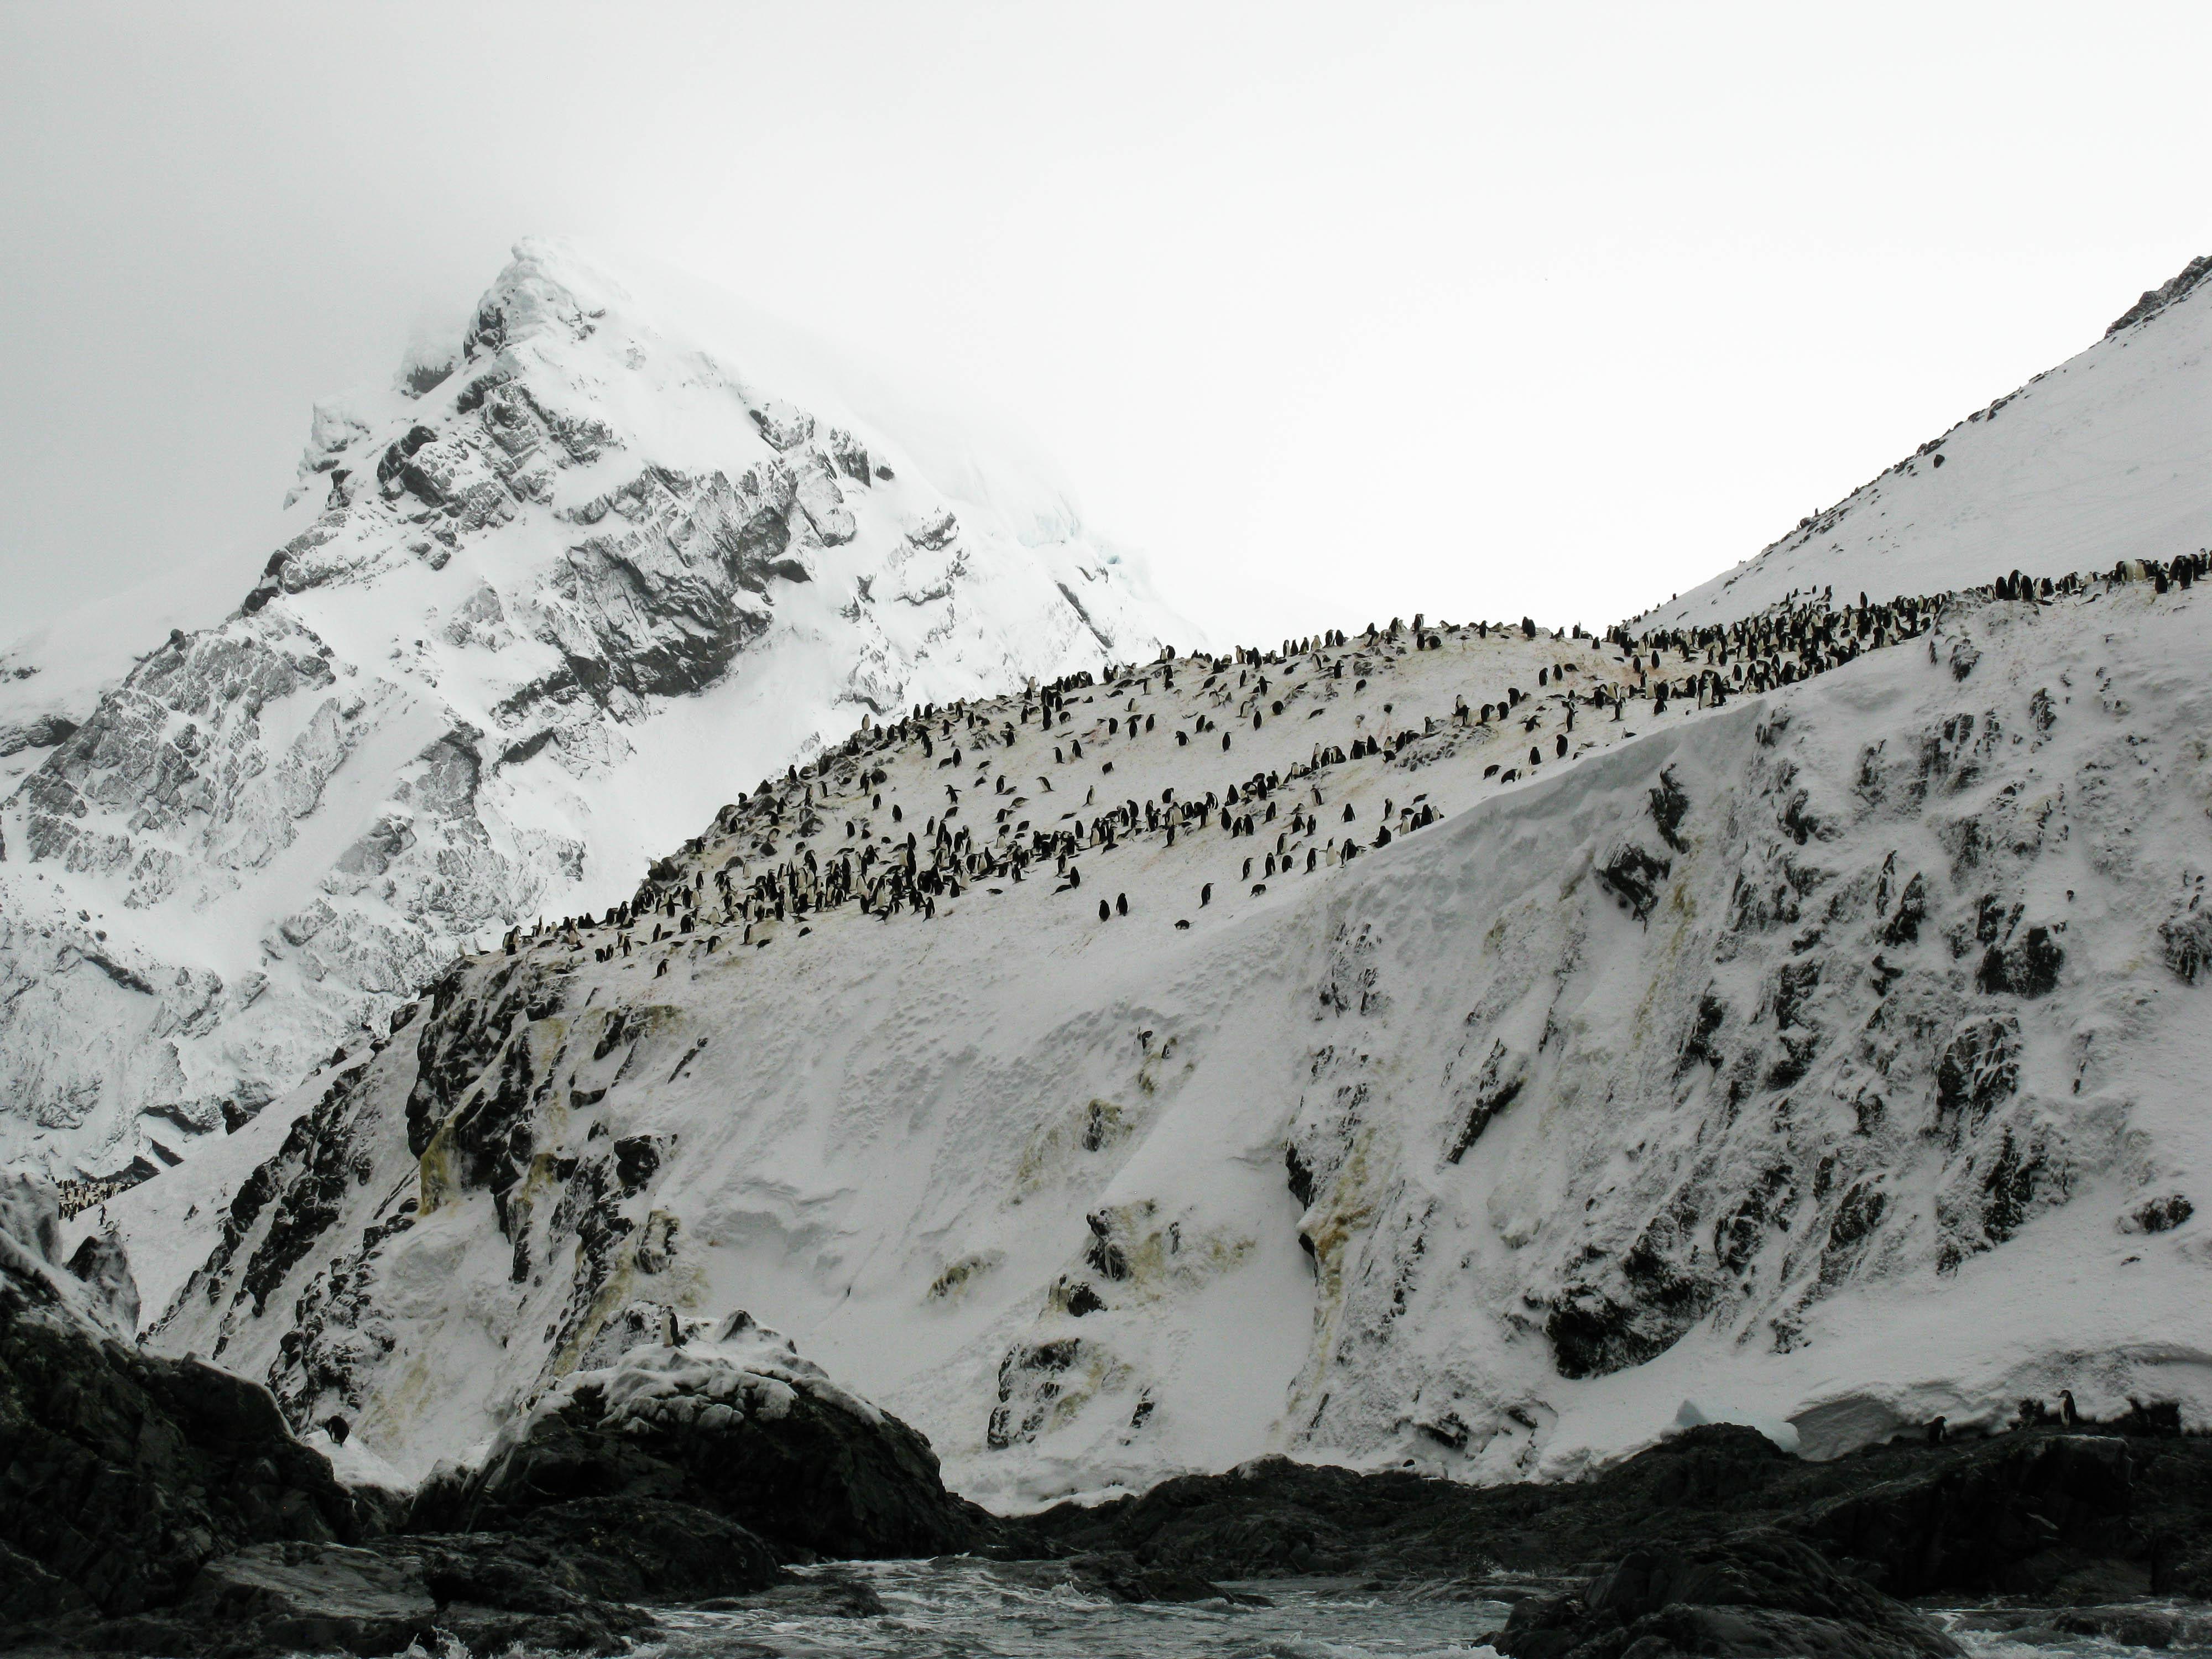 Chinstrap Penguin colony, Elephant Island